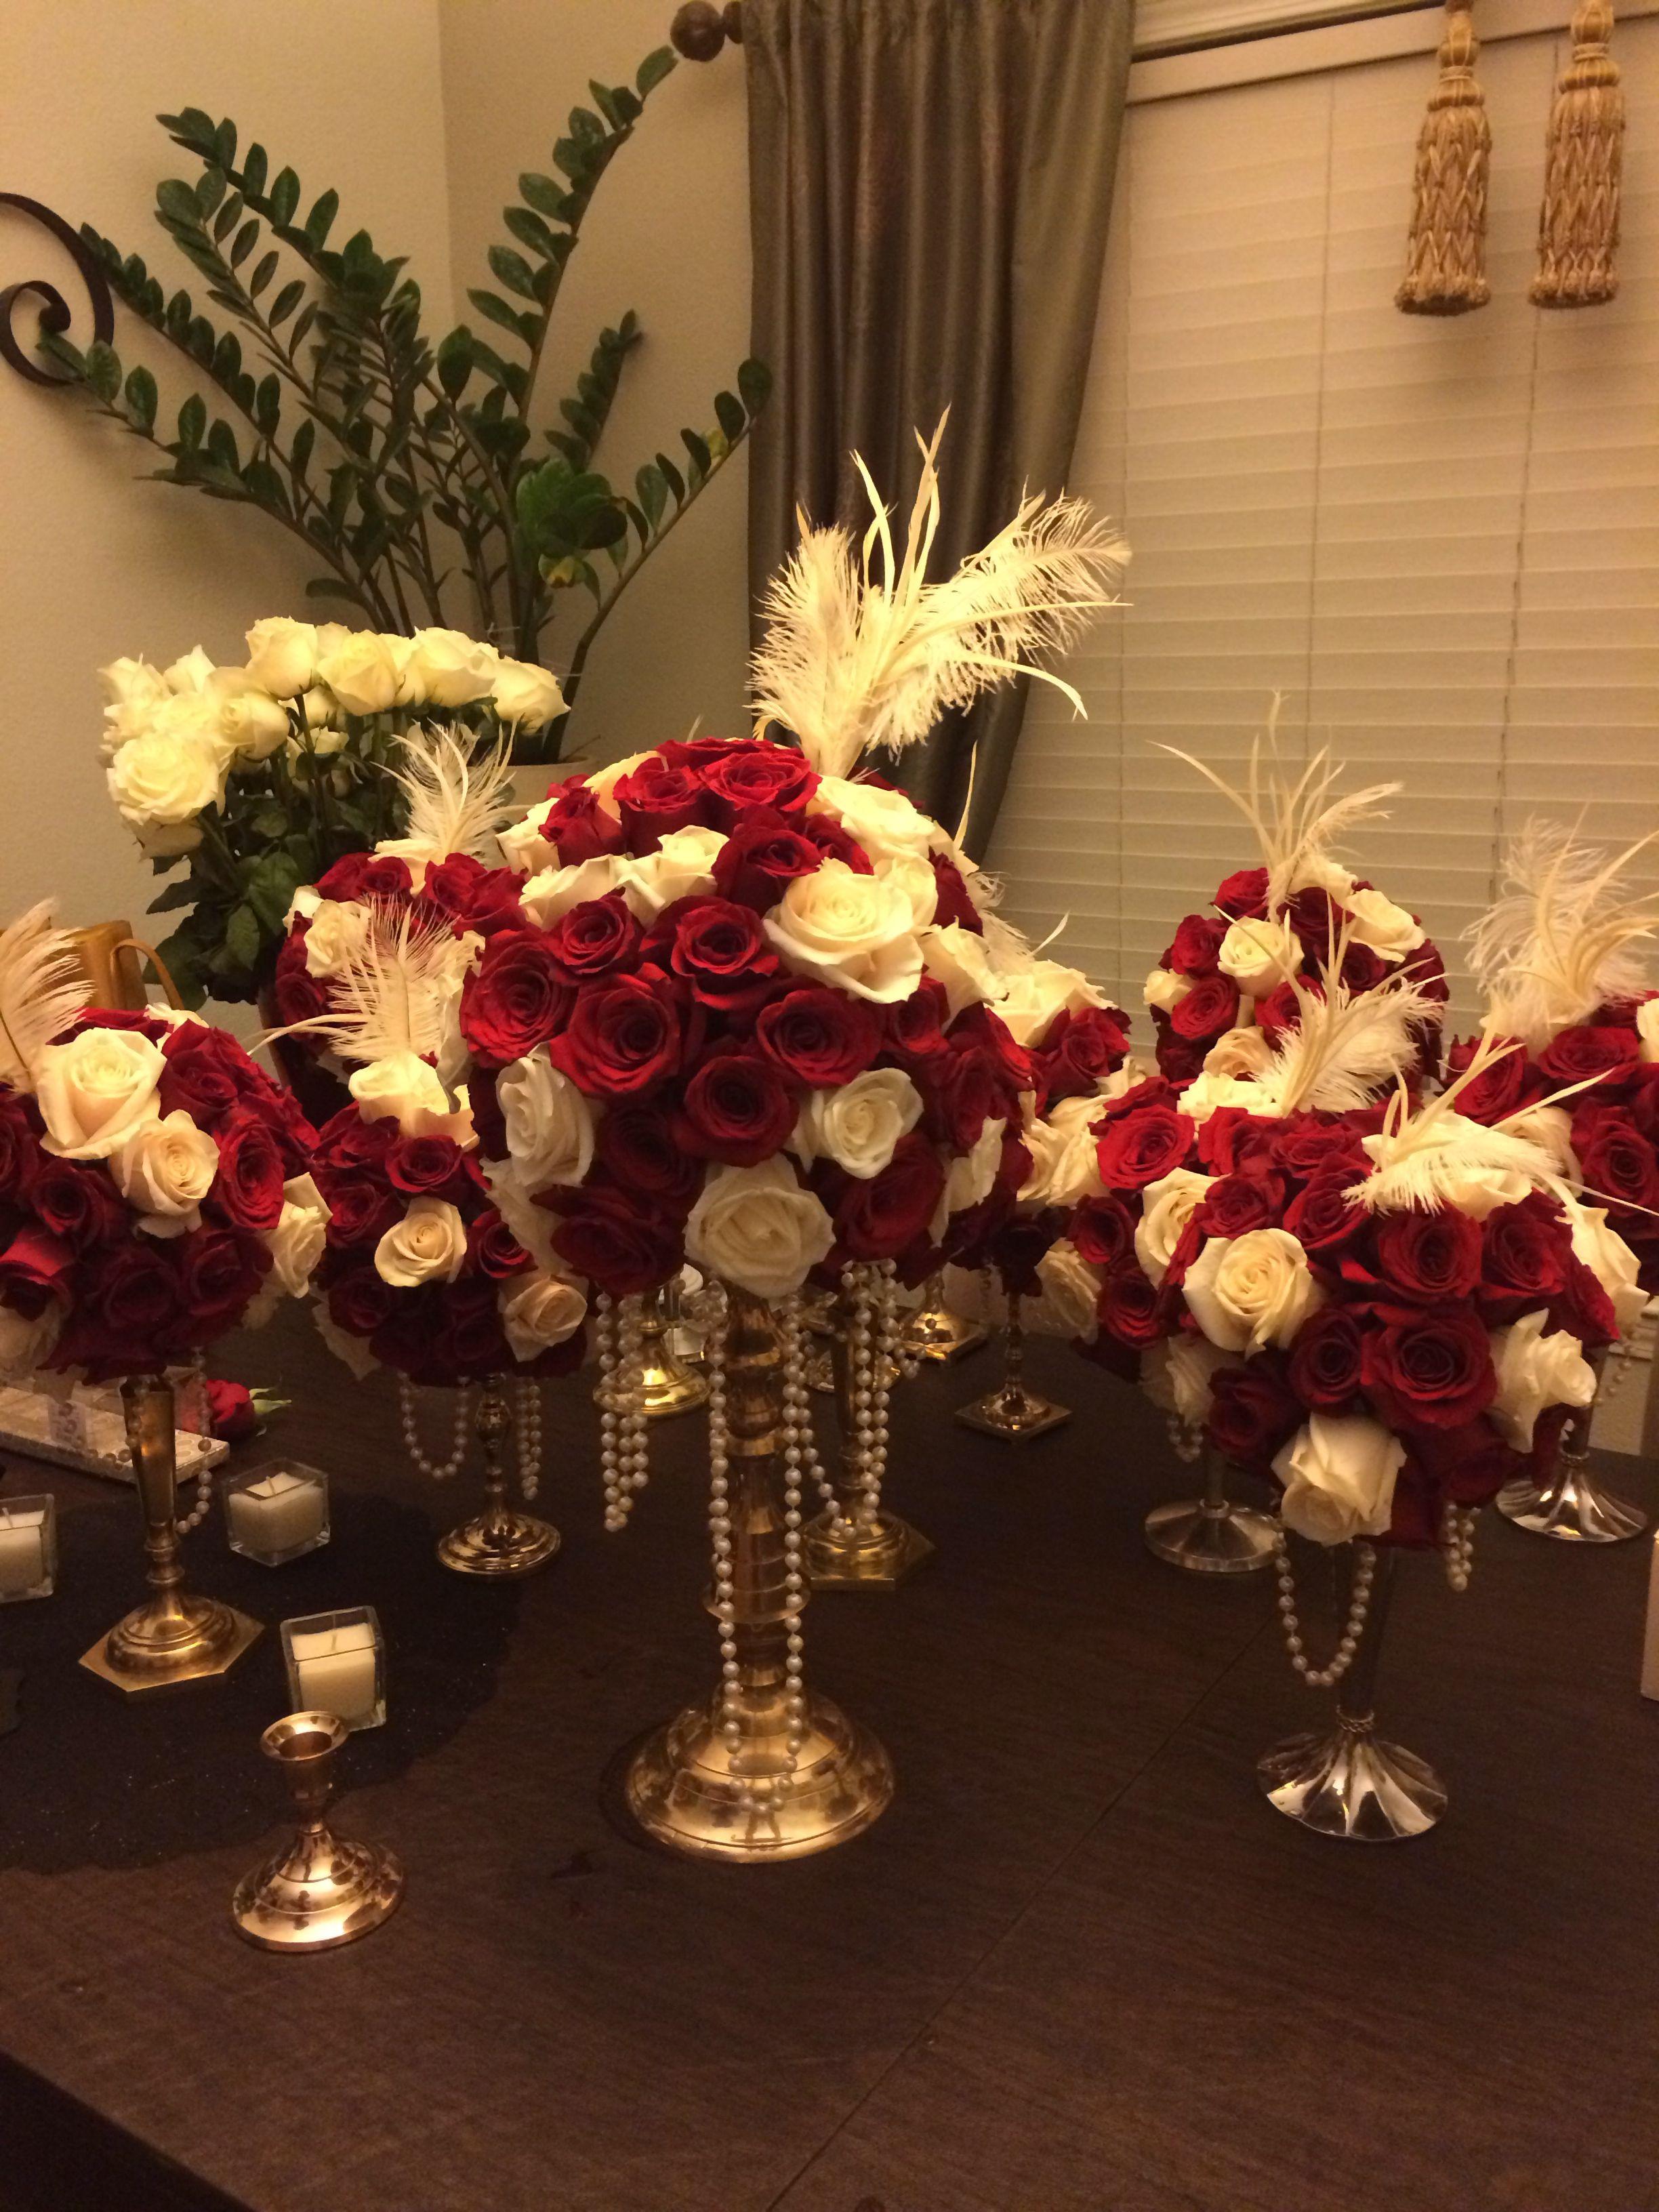 1920s wedding decoration ideas  My diy Great gatsby centerpieces  Decor ideas  Pinterest  Gatsby